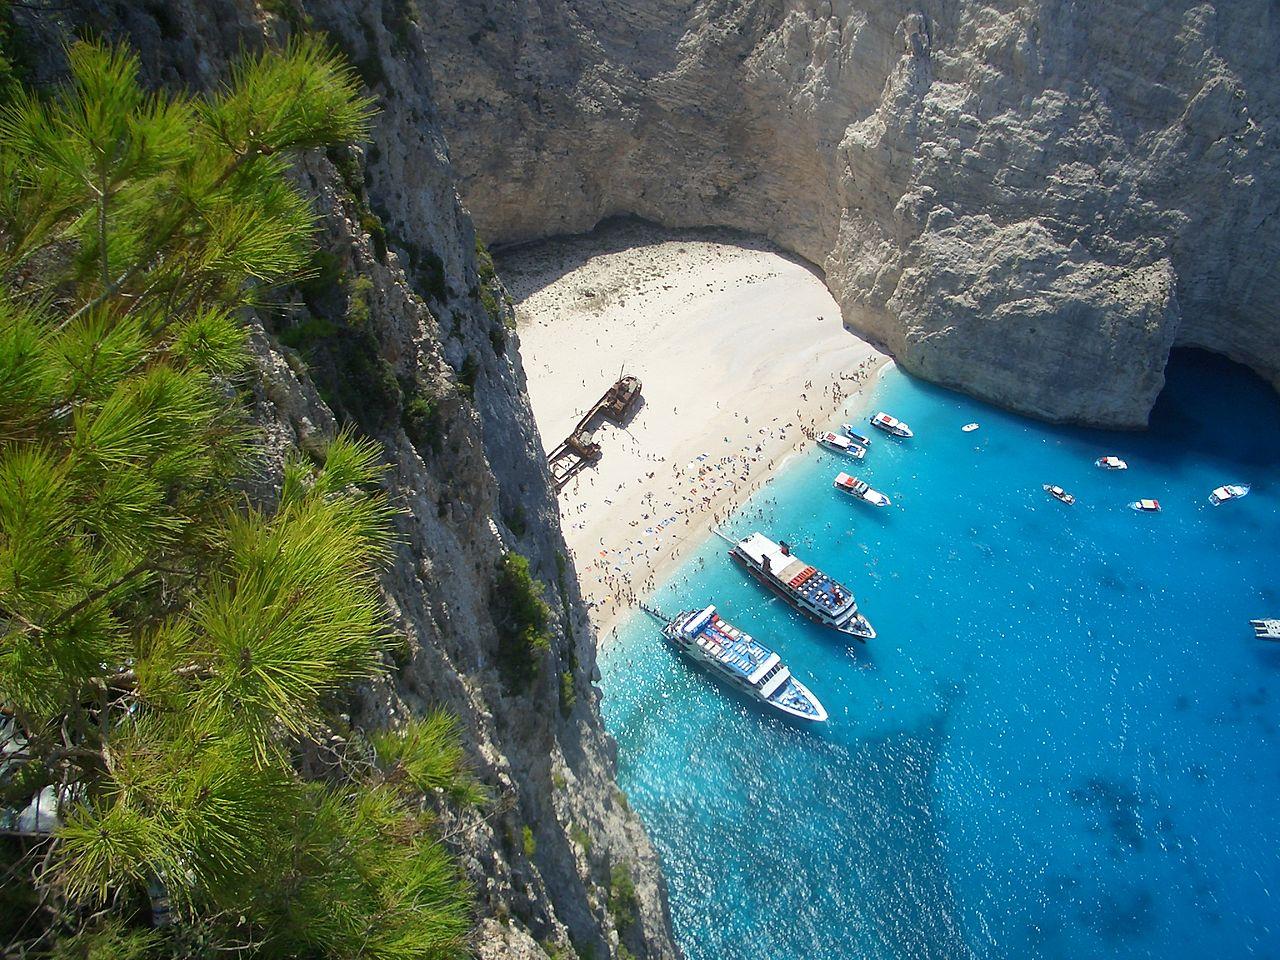 Navagio (shipwreck) - Zakynthos